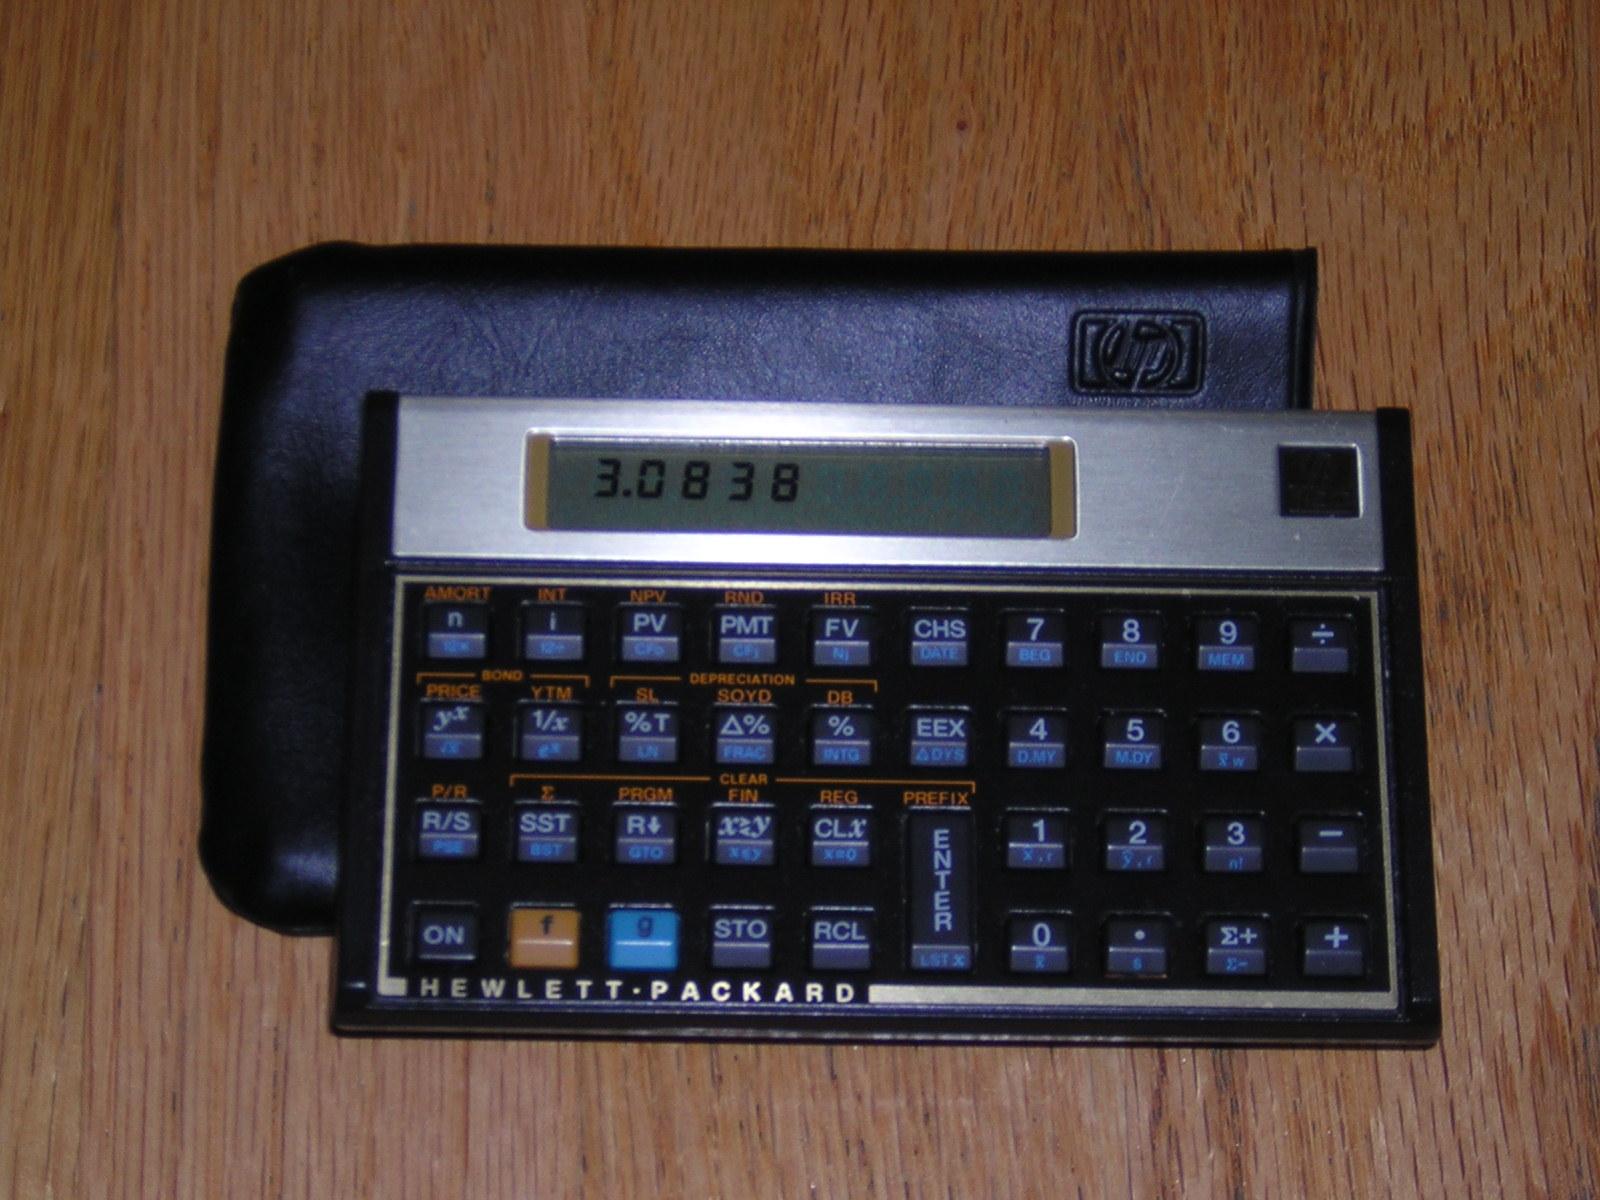 Hewlet Packard HP 12C financial calculator rental in Irvine, CA